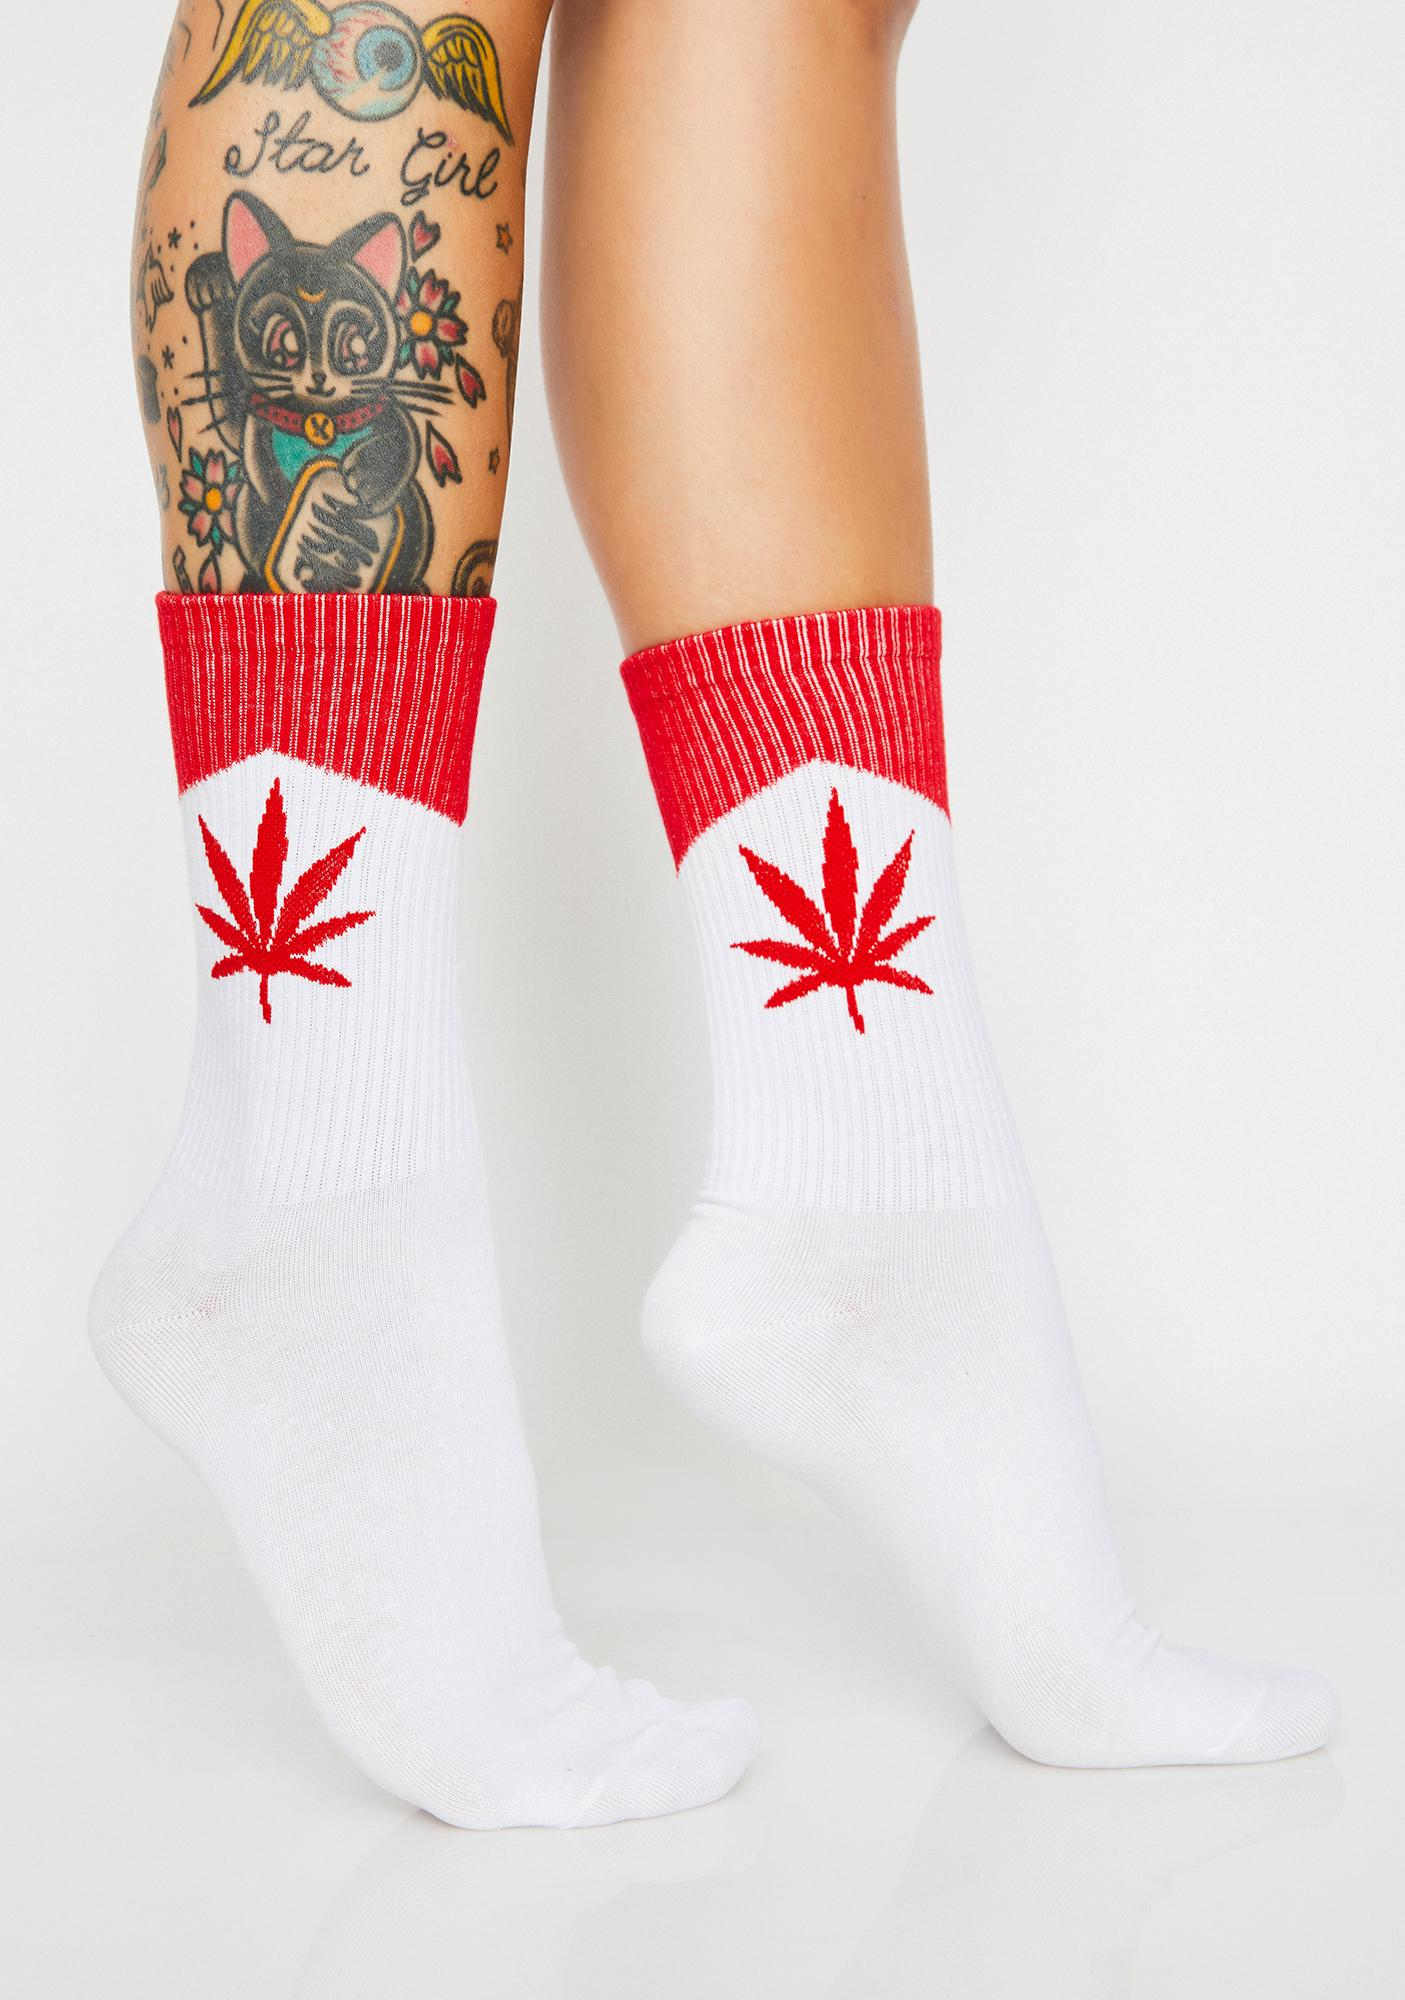 To Be Blunt Crew Socks